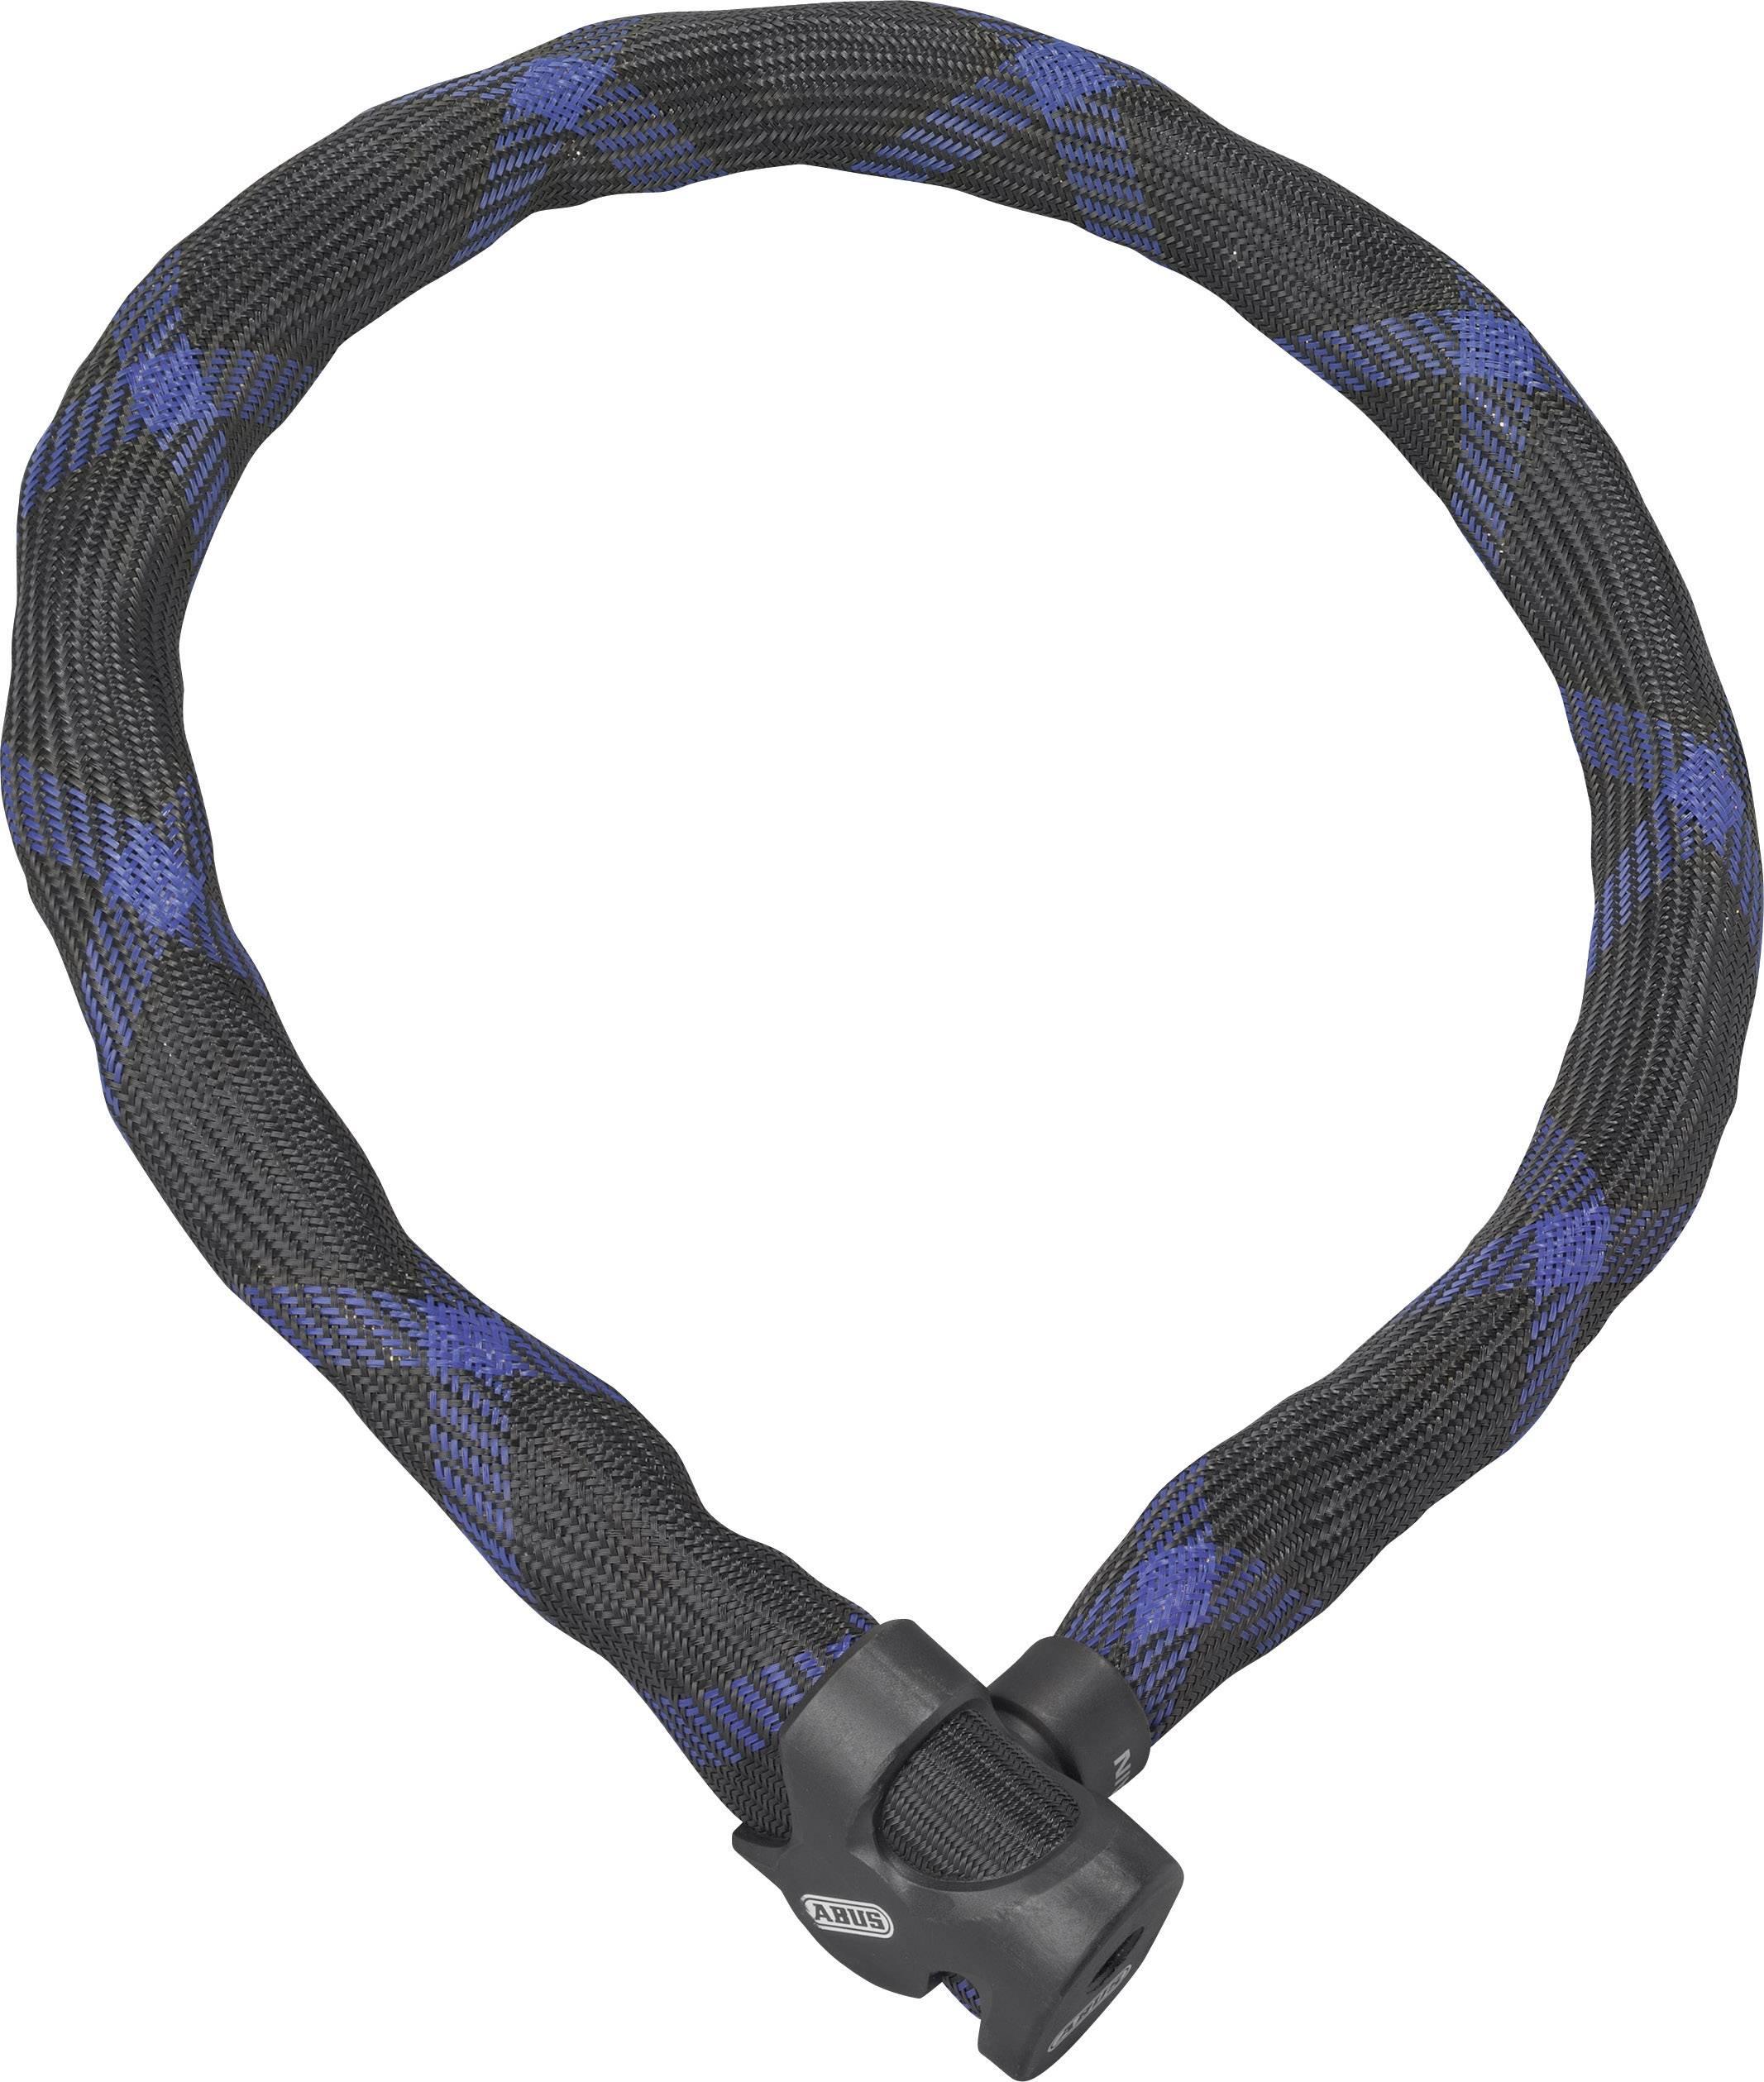 Zámok na reťaz ABUS 7210/110 Ivera Chain, (Ø x d) 7 mm x 1100 mm, čierna/modrá